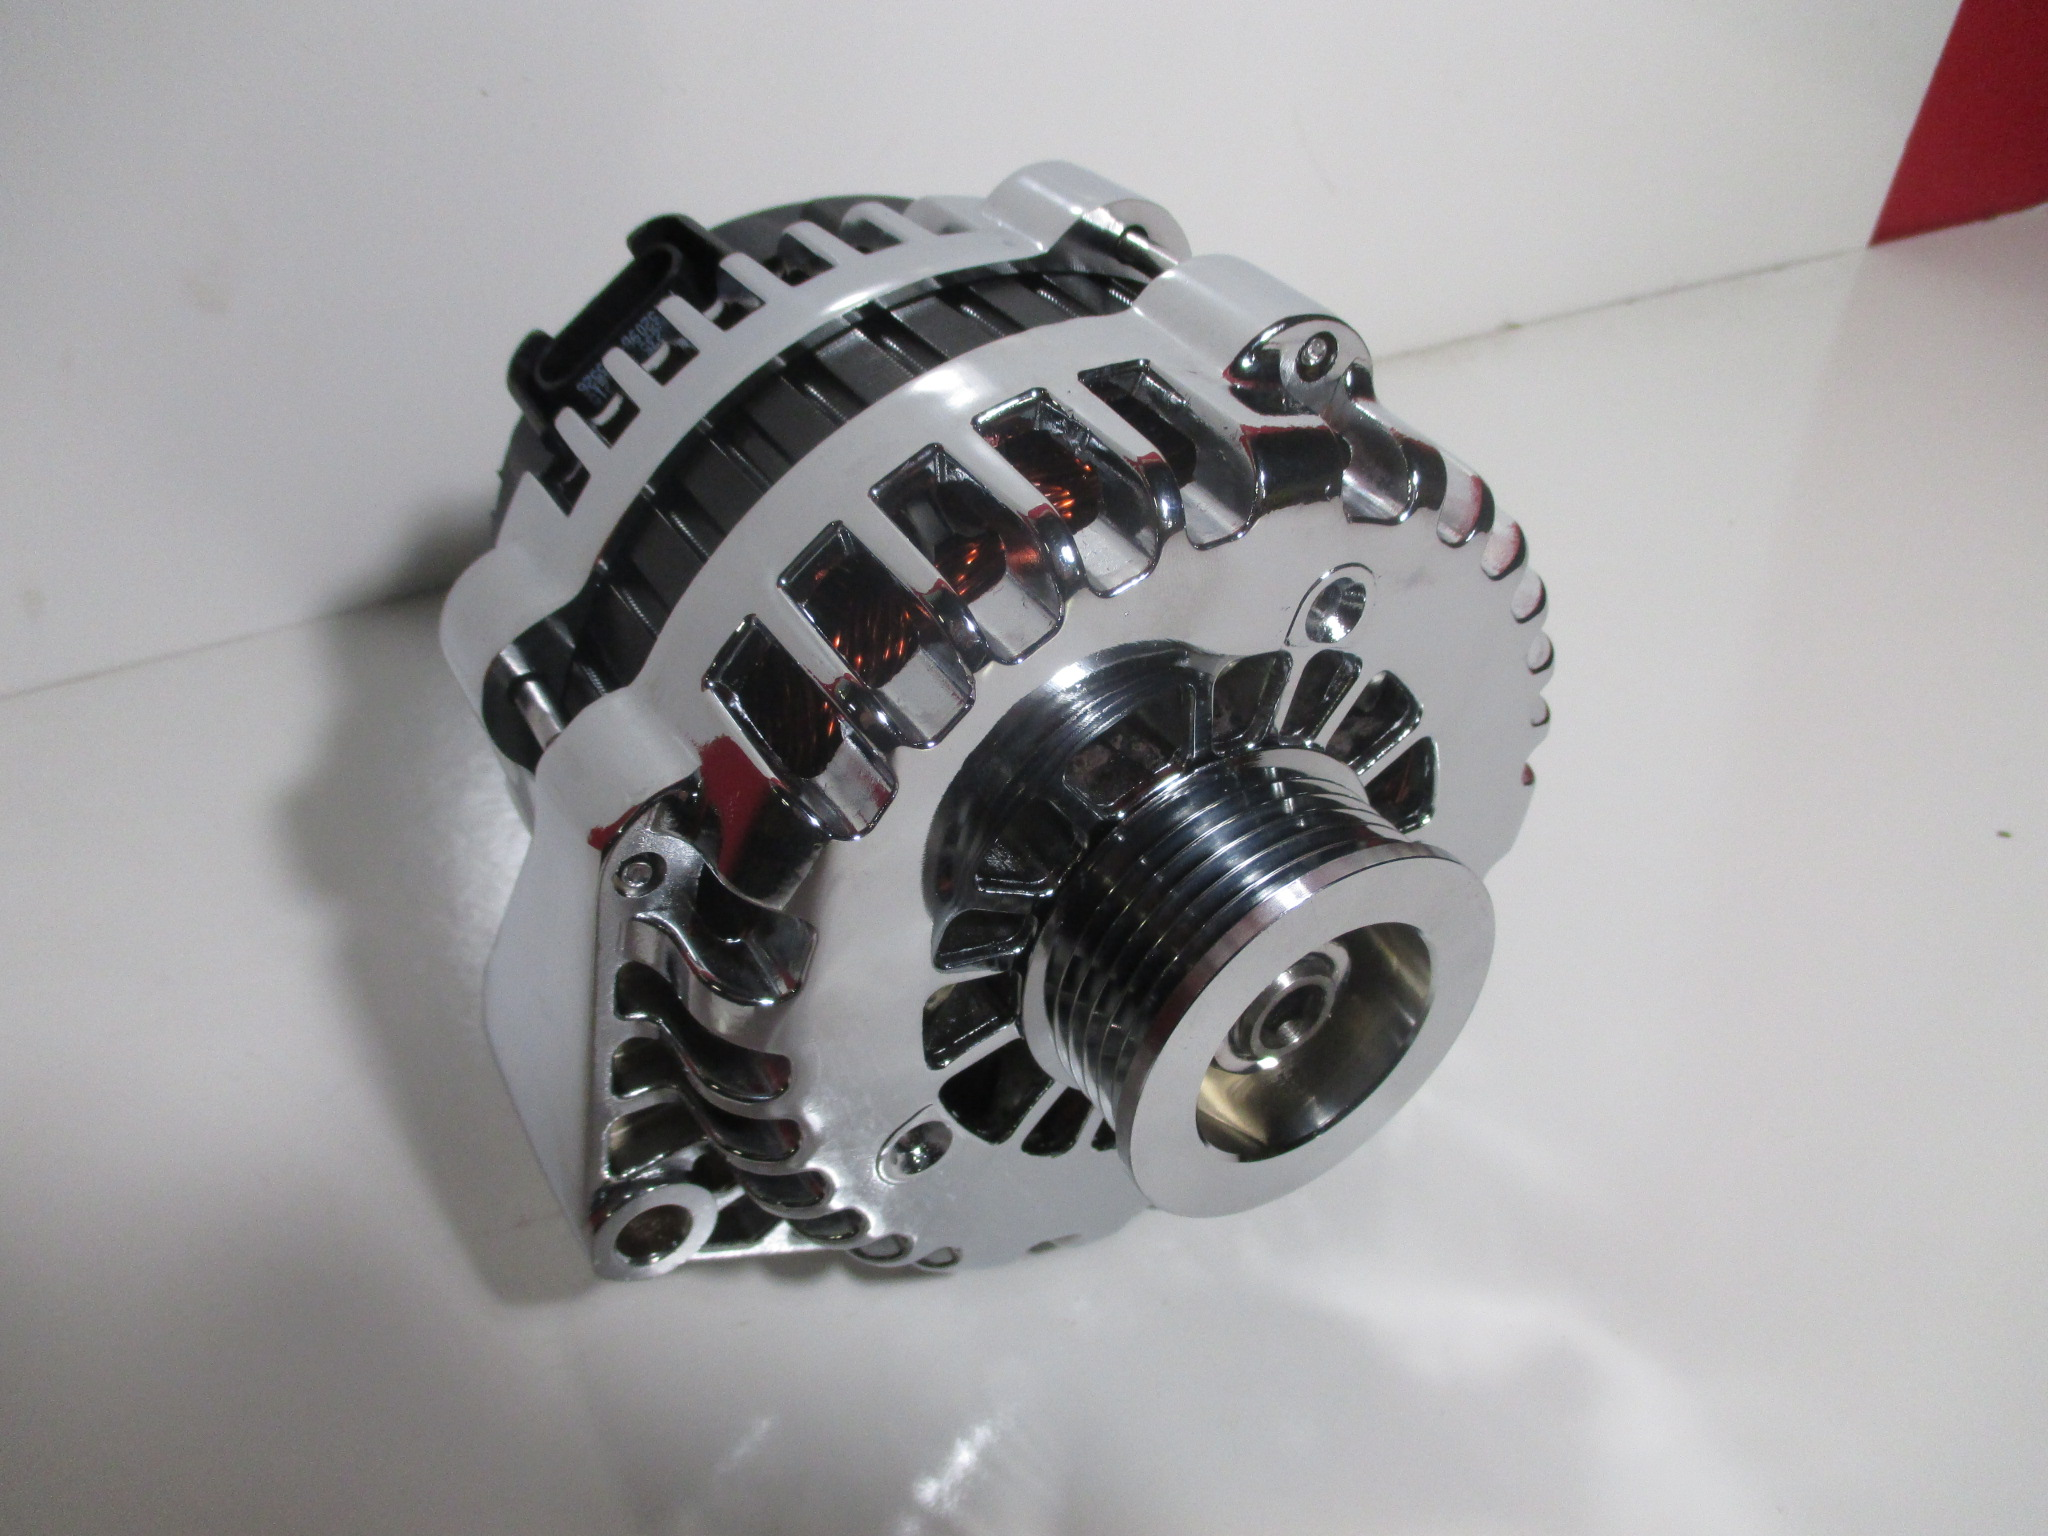 cs144 alternator wiring diagram mitsubishi pajero diagrams gm cs 144 schematic